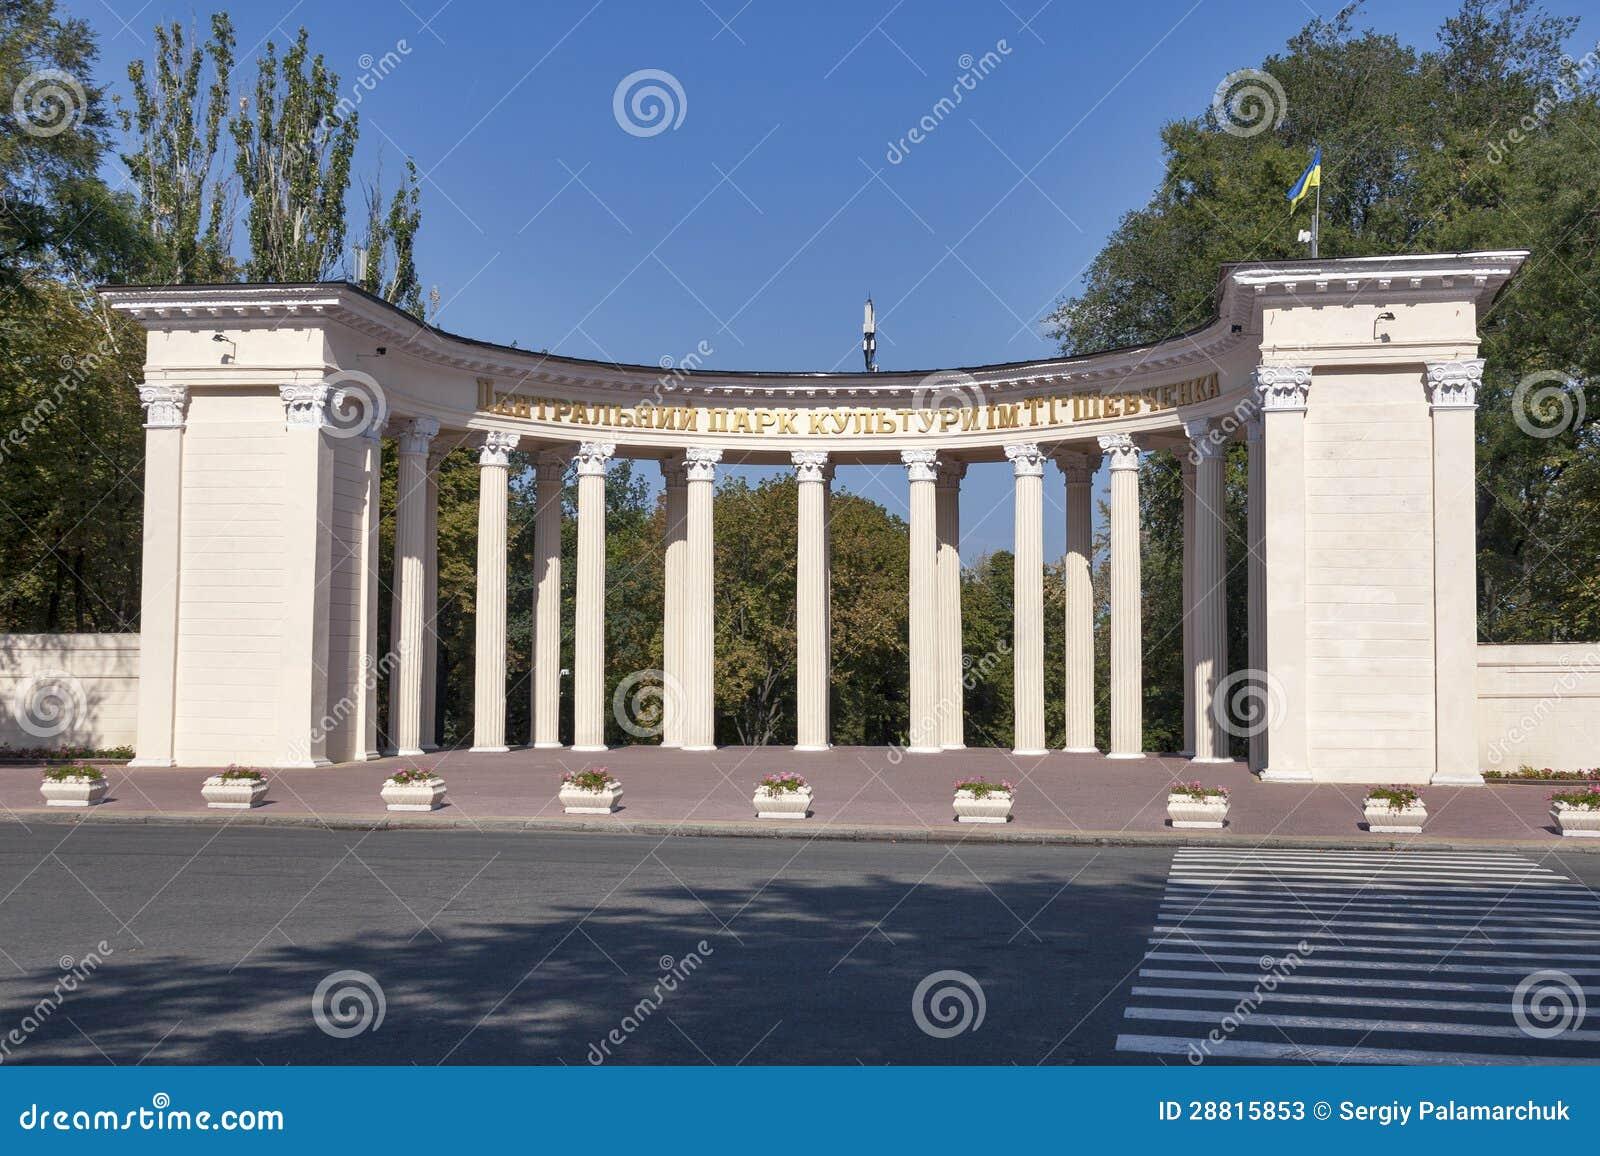 Dnipropetrovsk T. Shevchenko Recreation公园